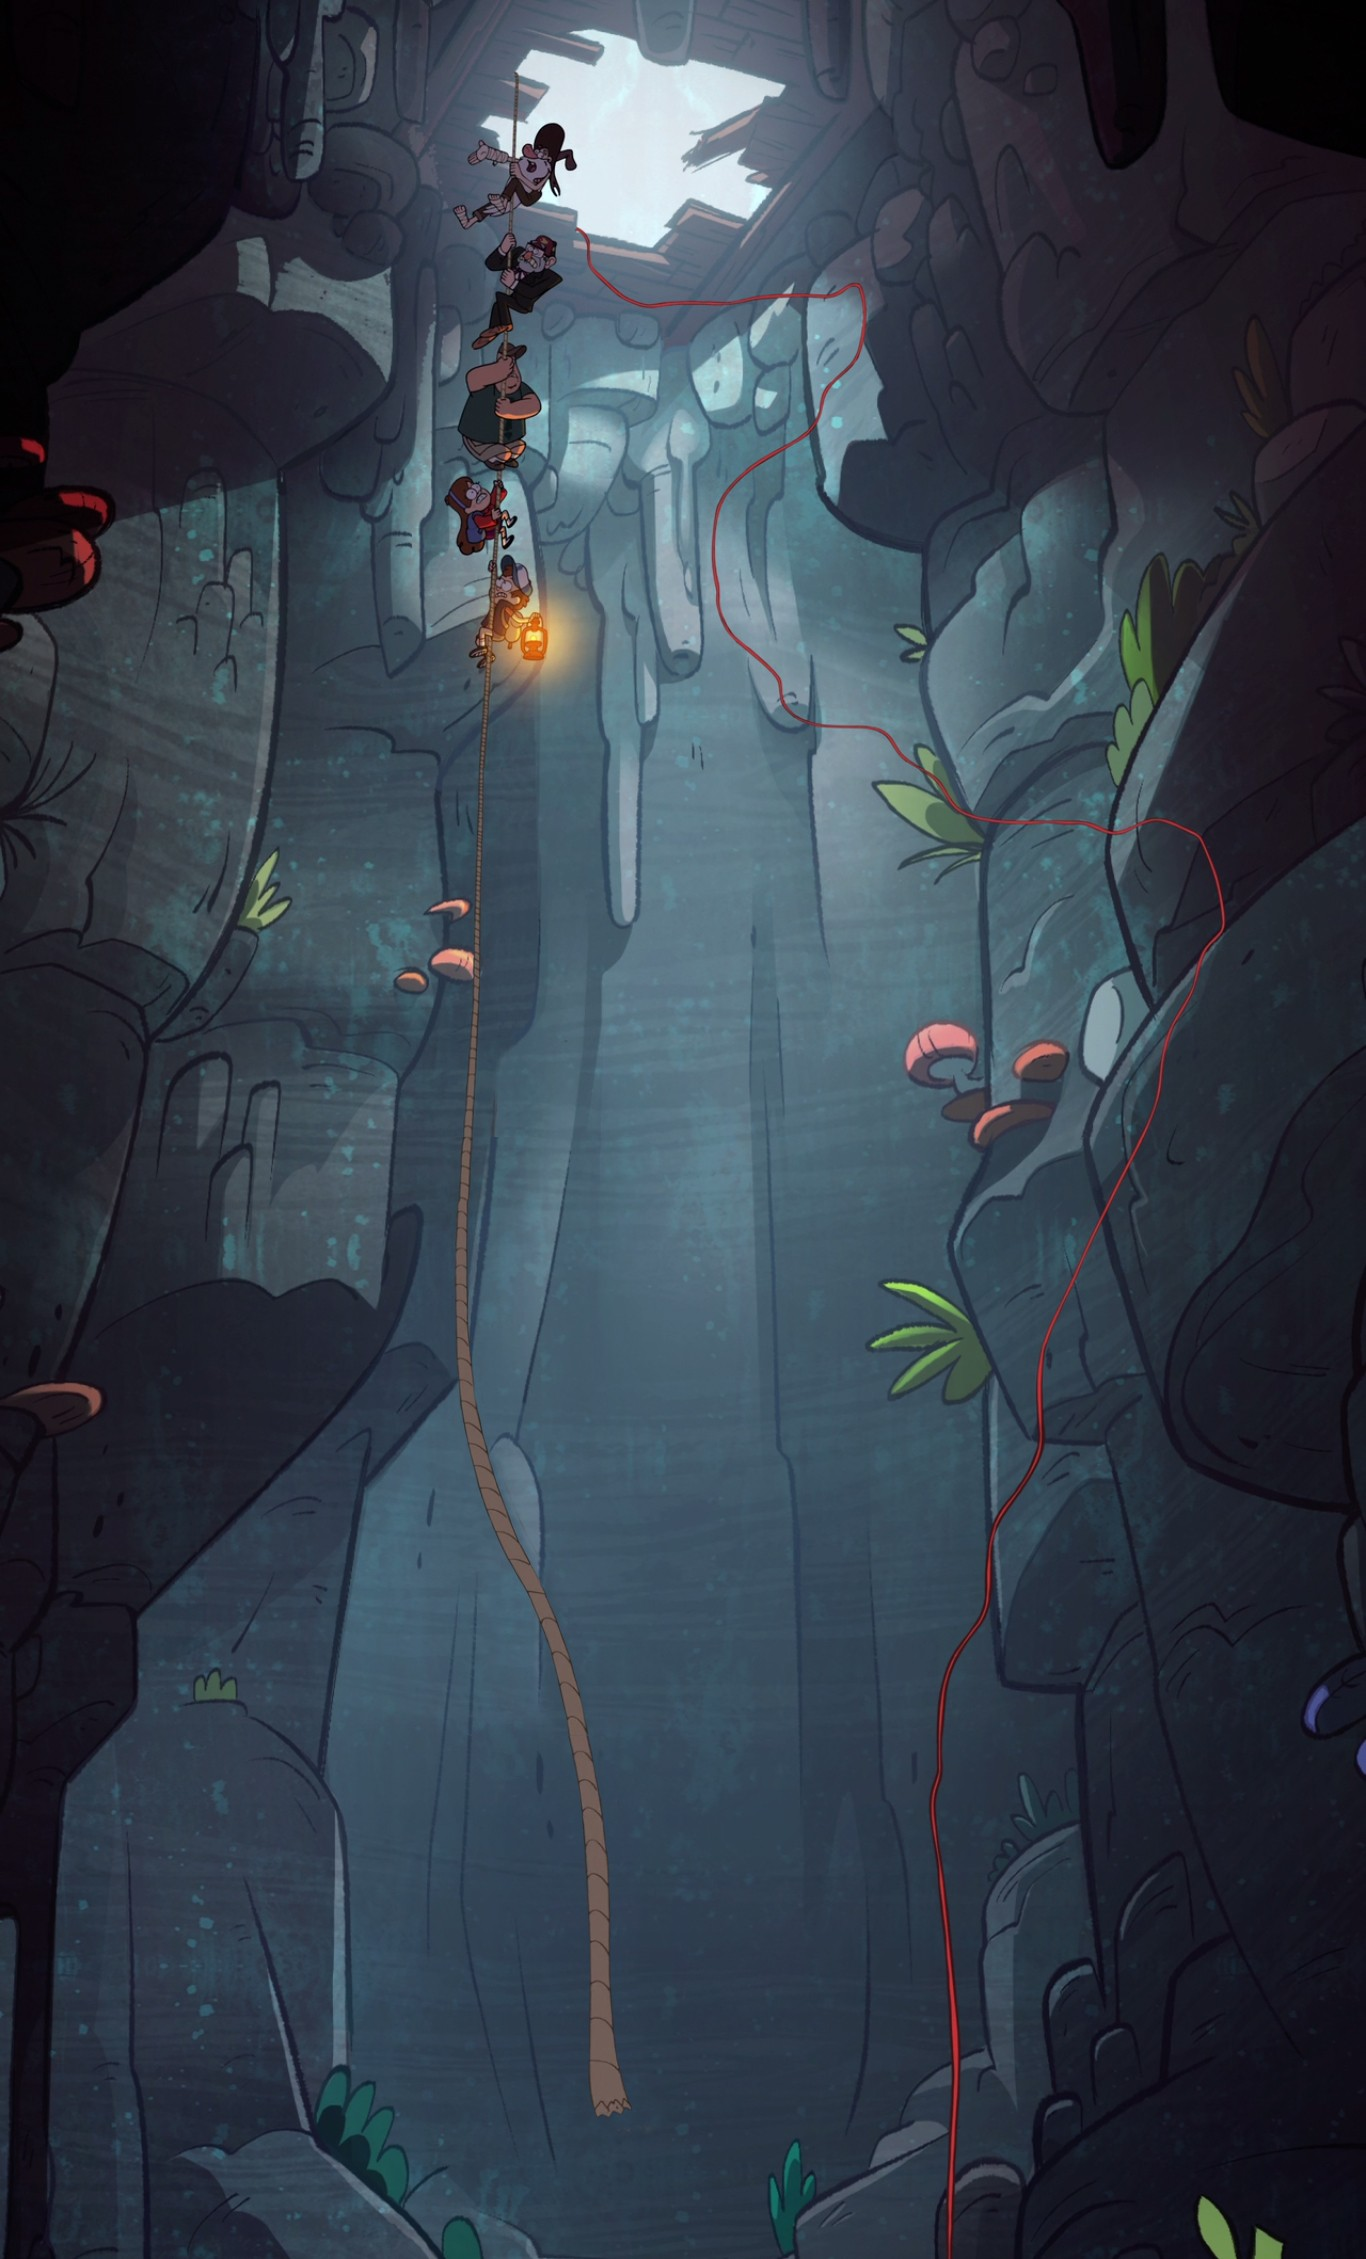 Gravity Falls Bill Iphone Wallpaper 59 Gravity Falls Backgrounds 183 ① Download Free Amazing Hd